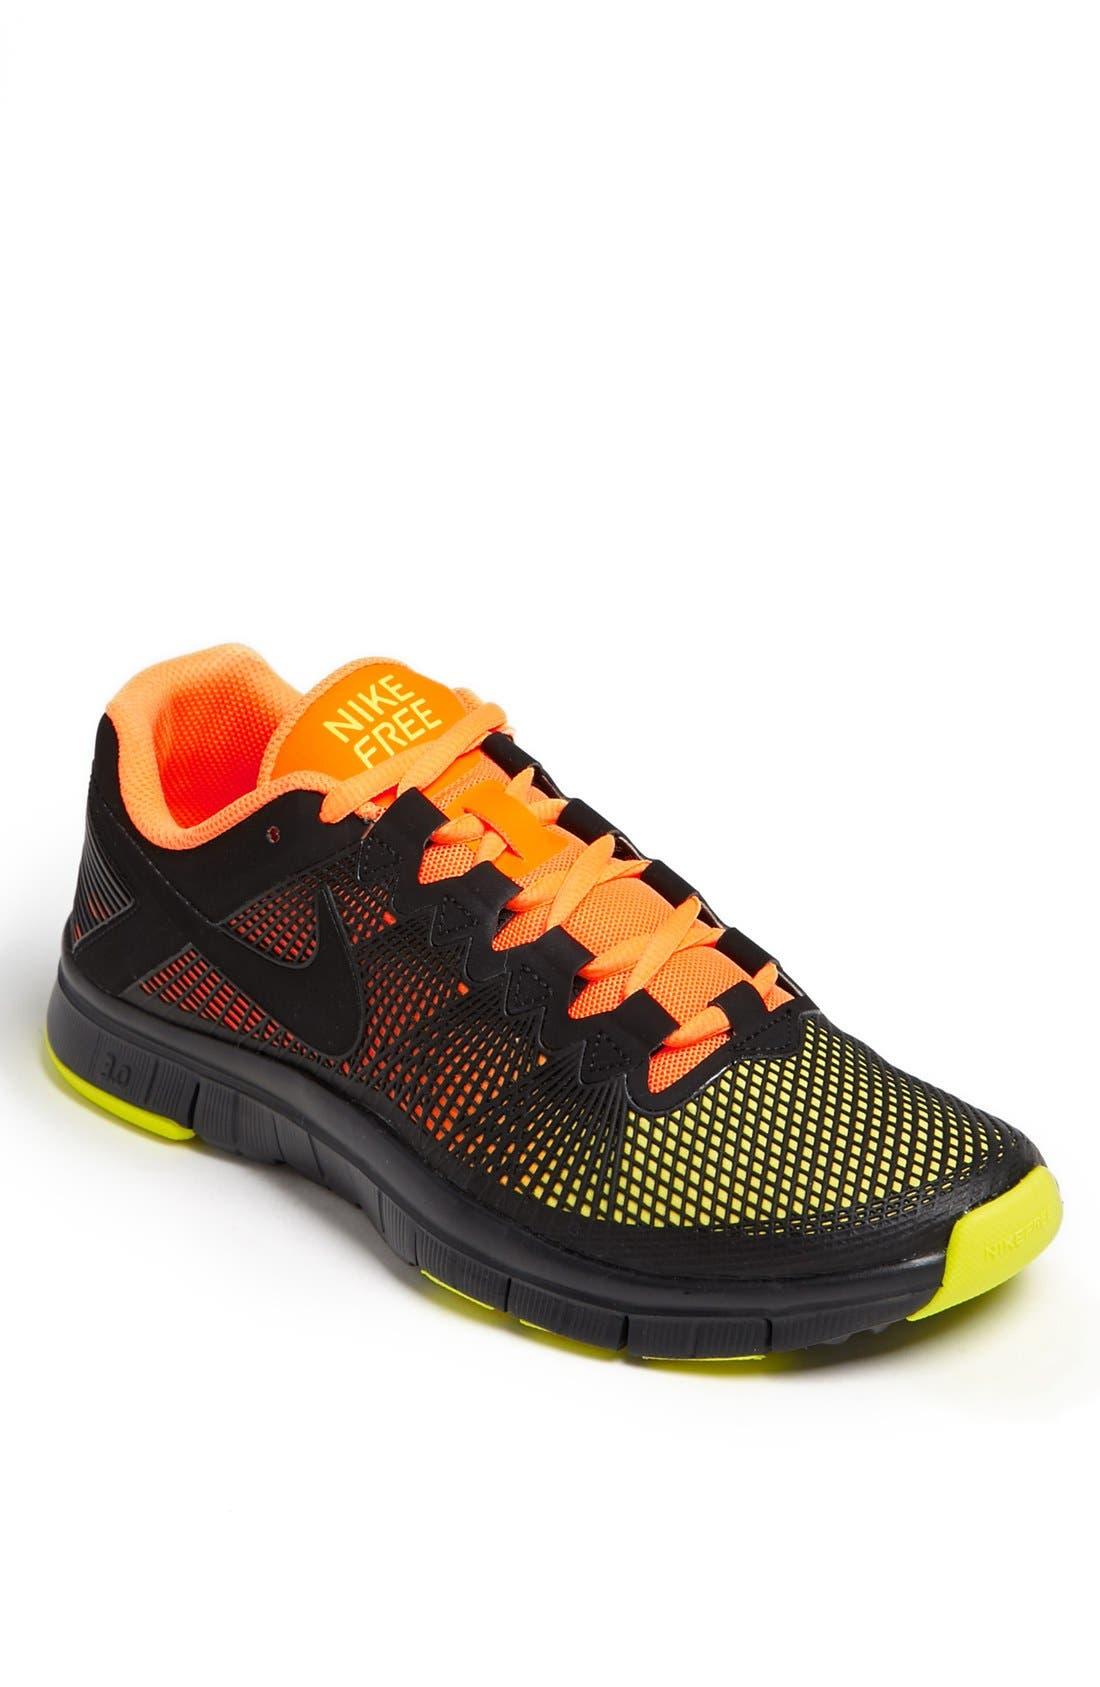 Alternate Image 1 Selected - Nike 'Free Trainer 3.0 NRG' Training Shoe (Men)